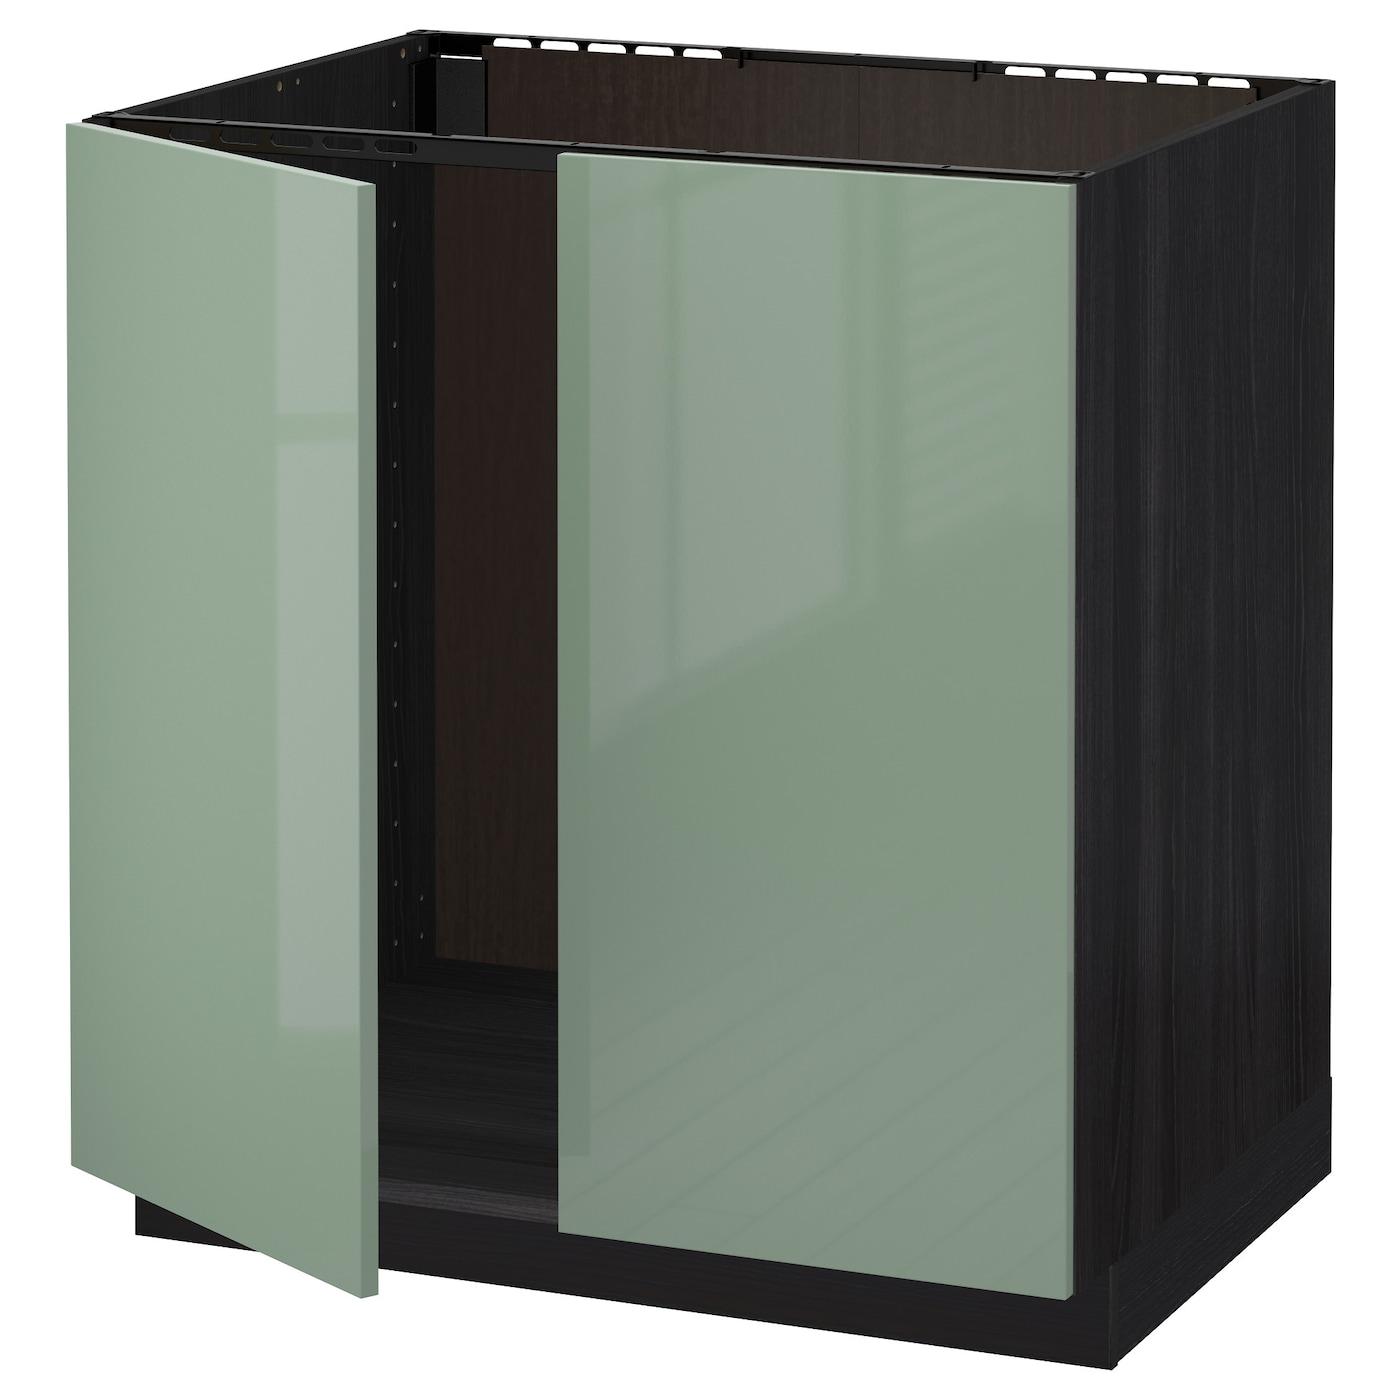 Ikea Kitchen Cabinet Construction: METOD Base Cabinet For Sink + 2 Doors Black/kallarp Light